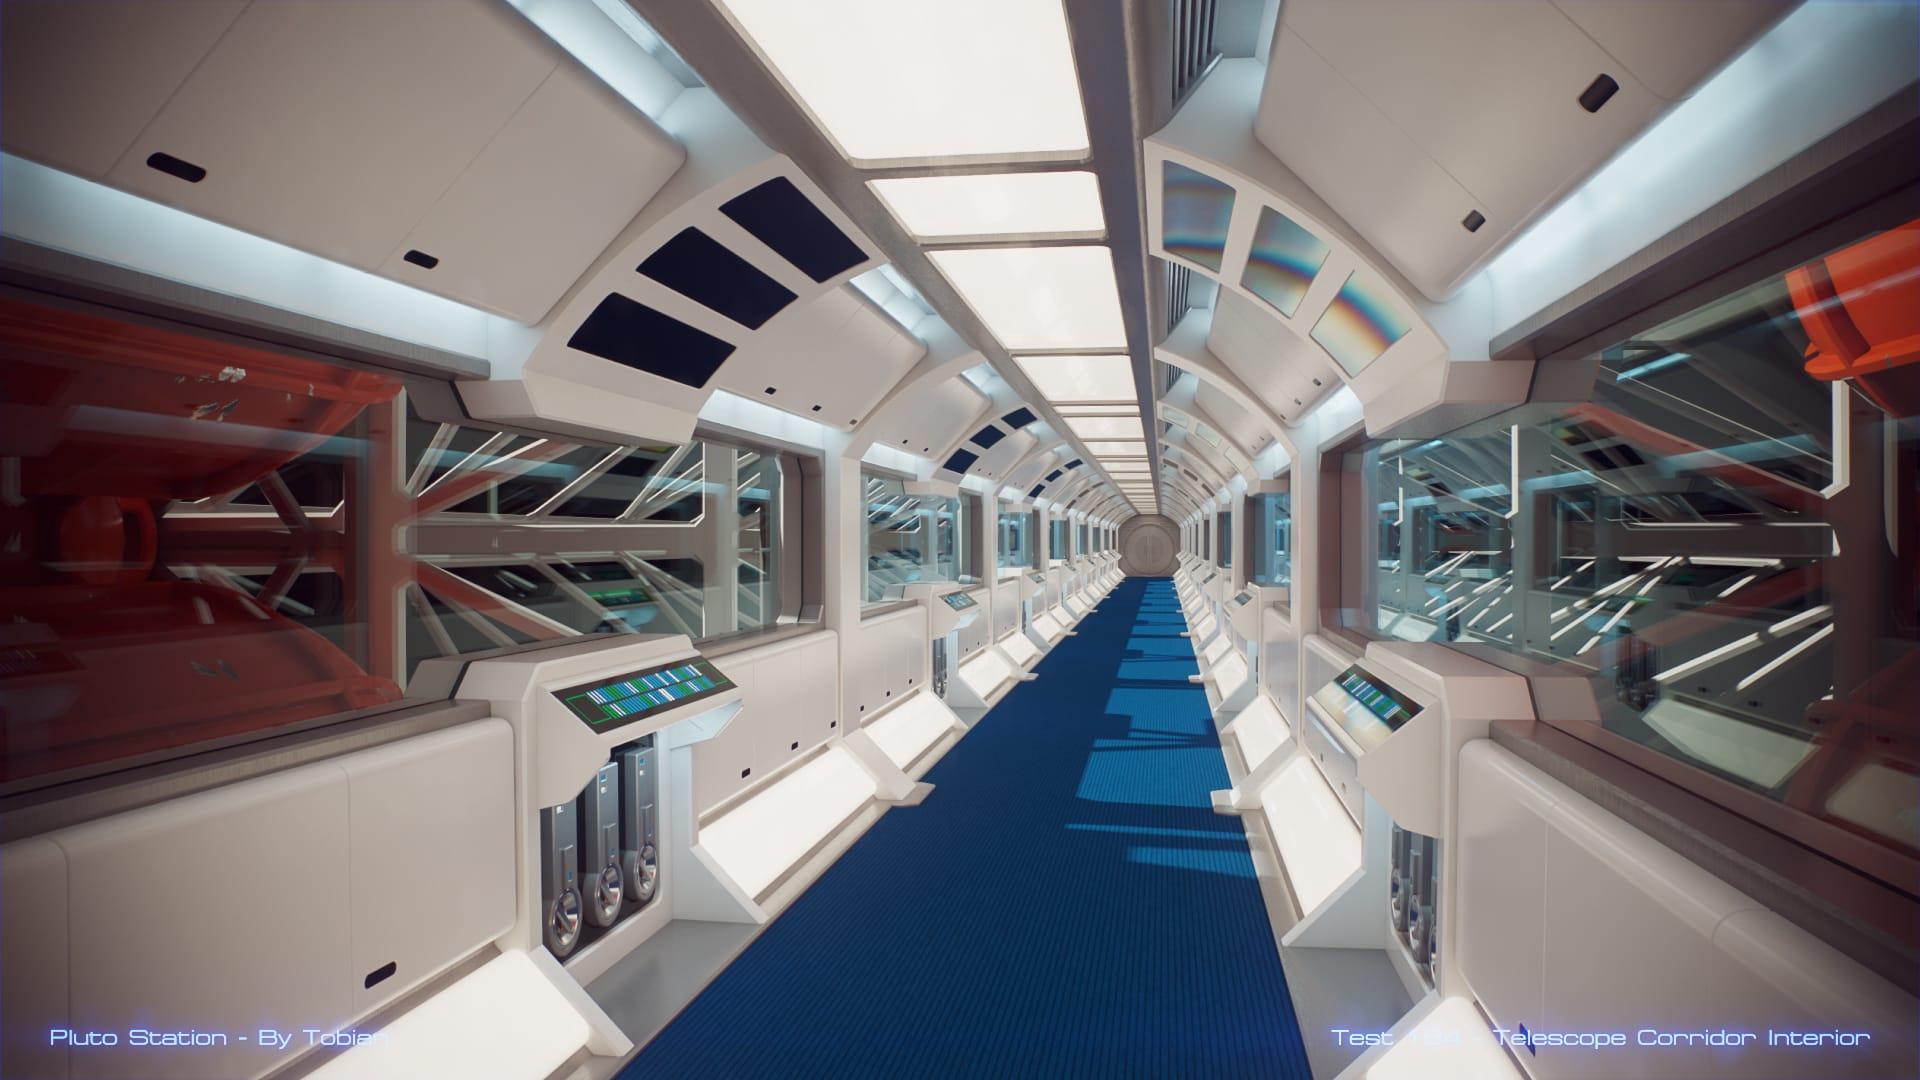 Pluto Station – Telescope Corridor Interior